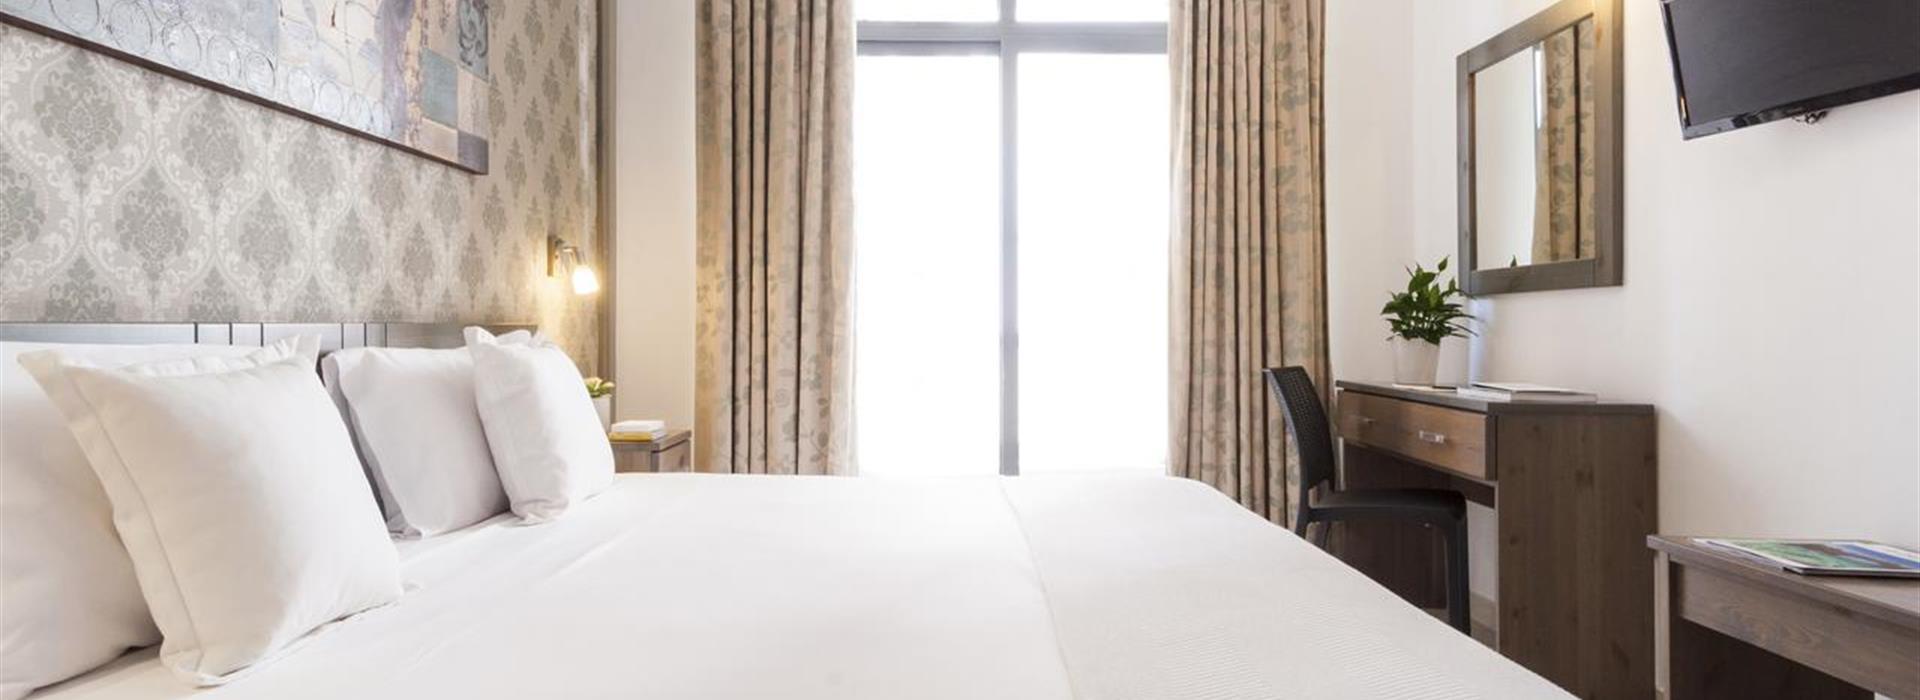 alenxadra-hotel-malta